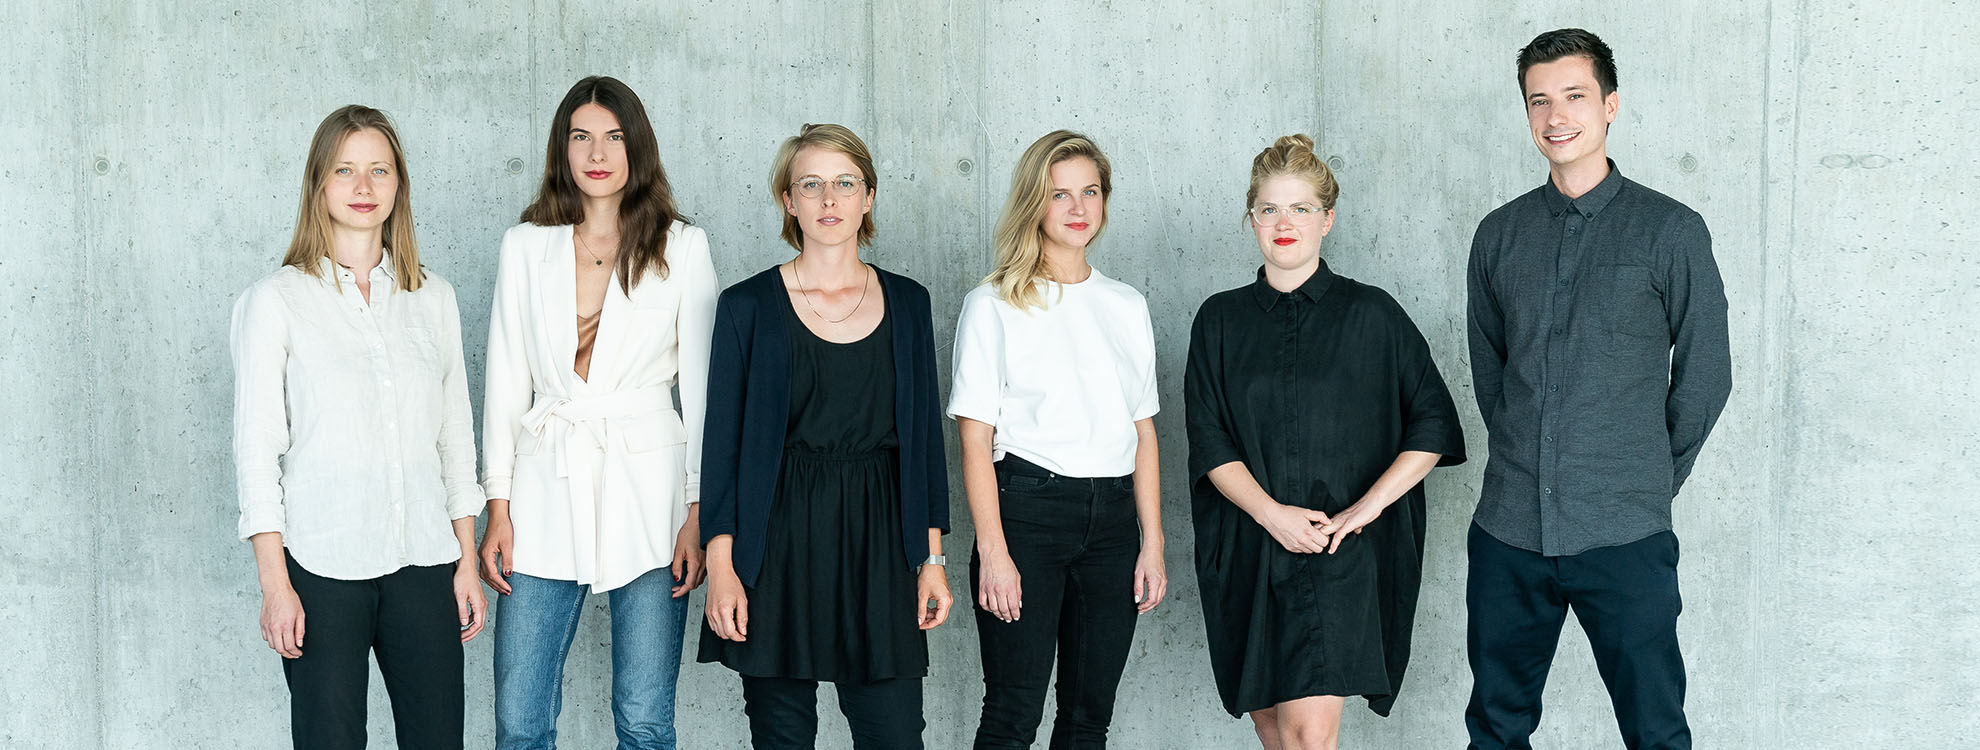 Fotograf Berlin - Business Portraits